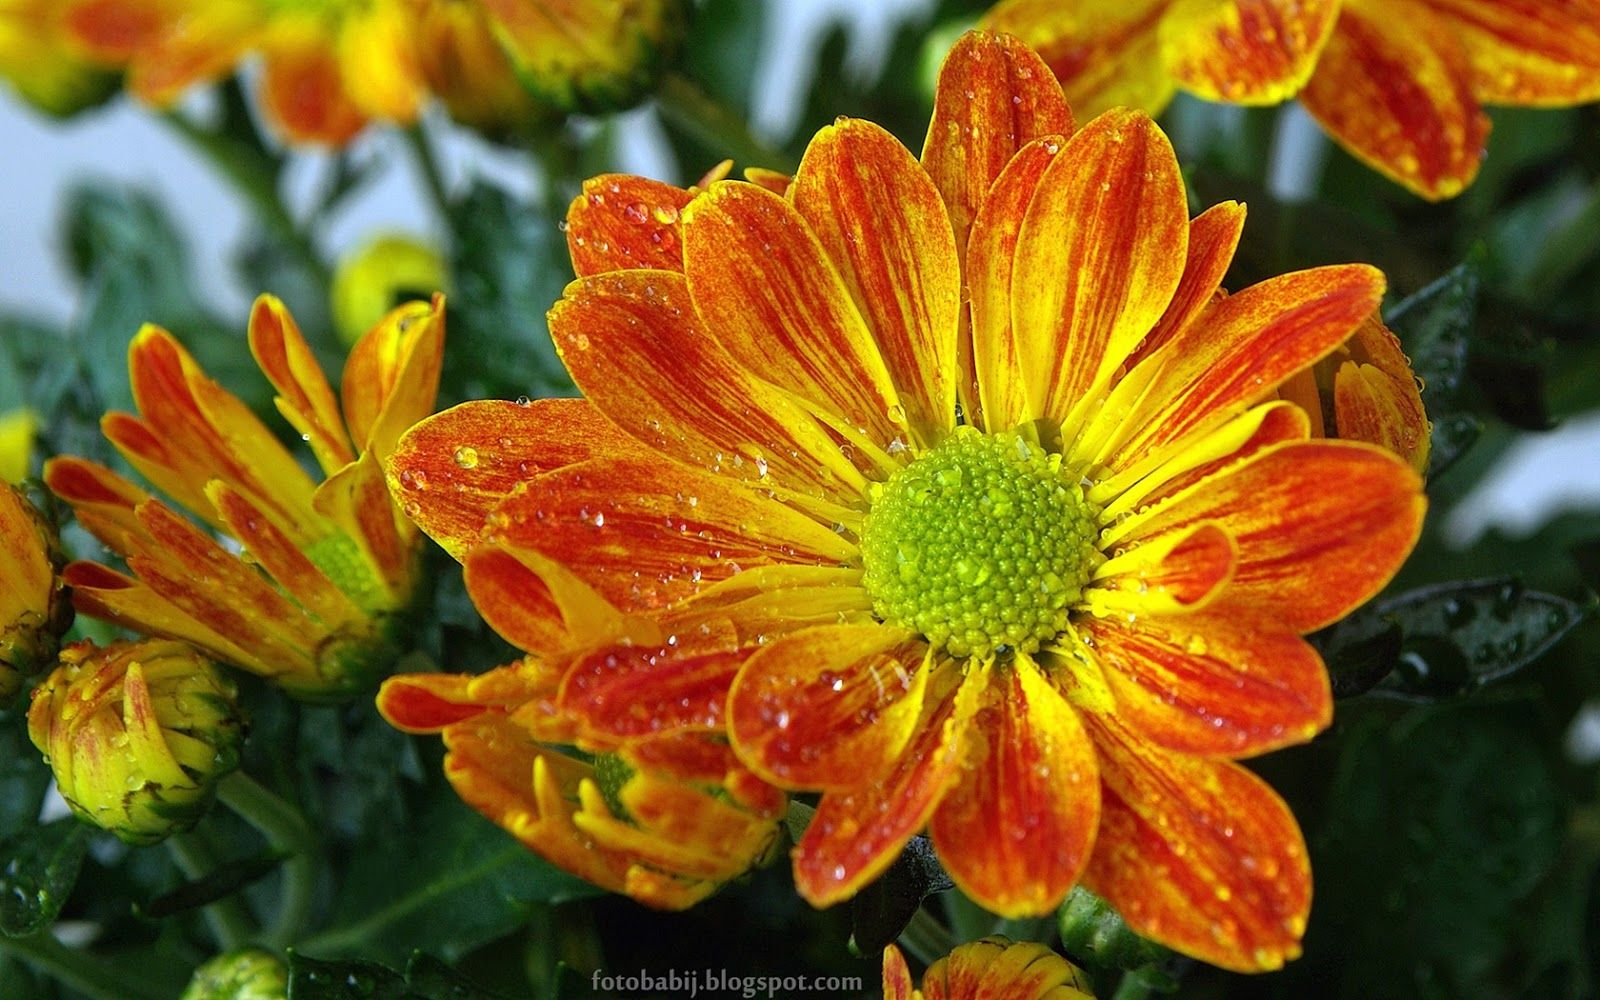 Tapety Na Pulpit 4k Ultra Hd Full Hd I Inne Rozdzielczosci Kwiat Chryzantemy Chrysanthemum Flower Chrysanthemum Flower Flower Wallpaper Chrysanthemum